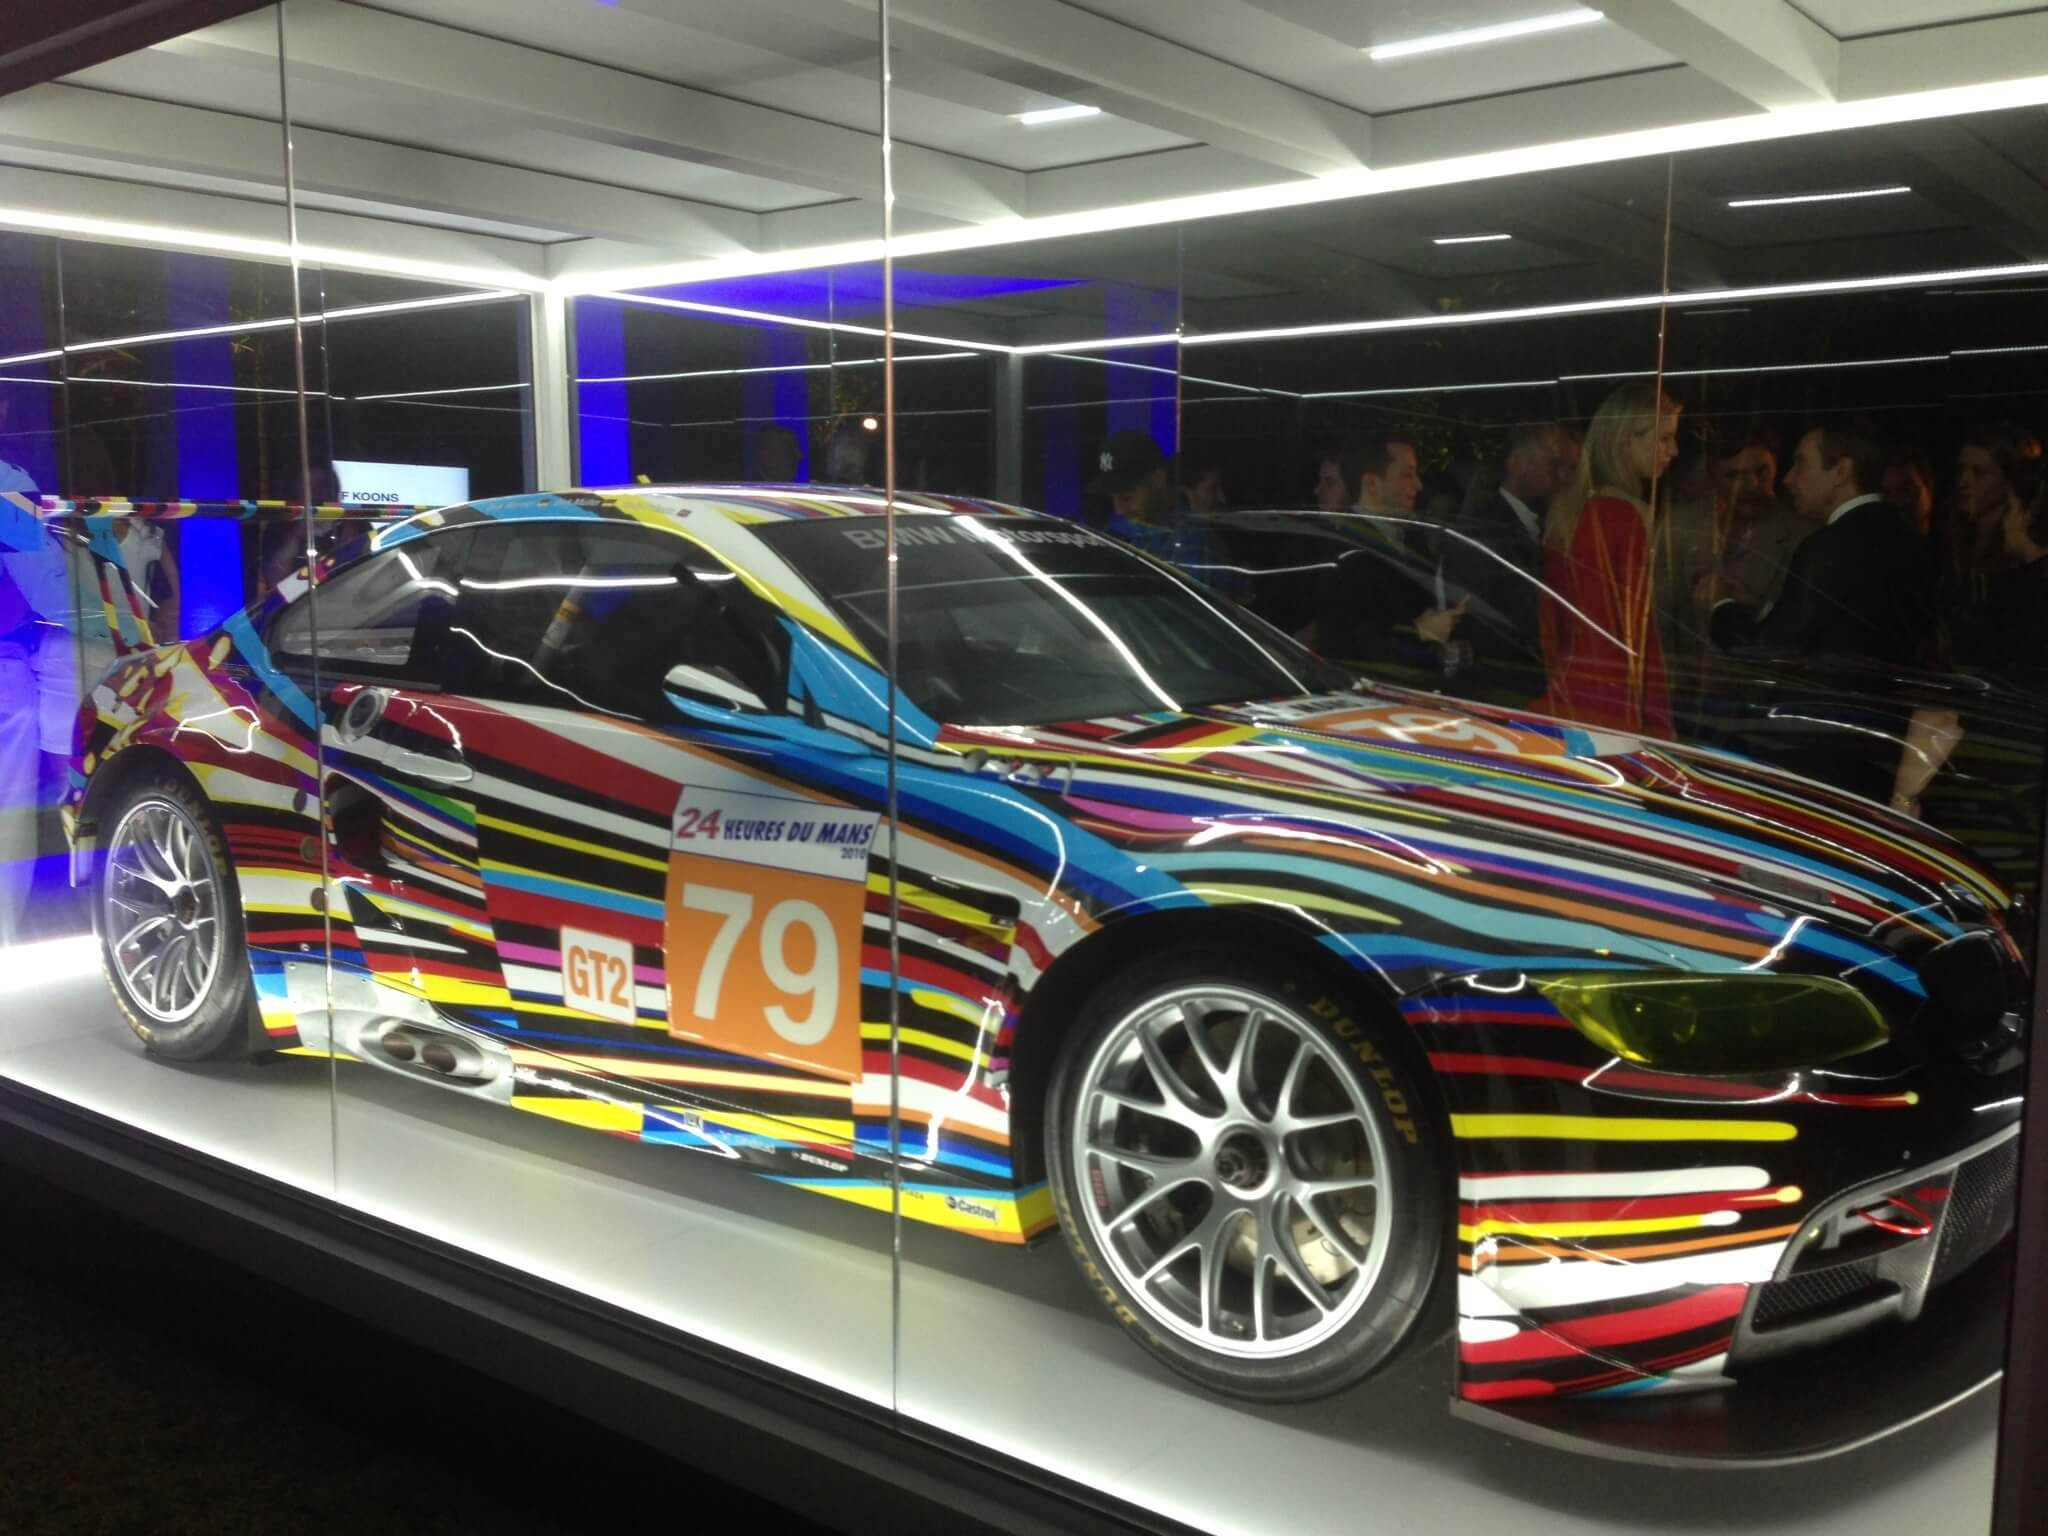 car painting ideas - Car Paint Design Ideas